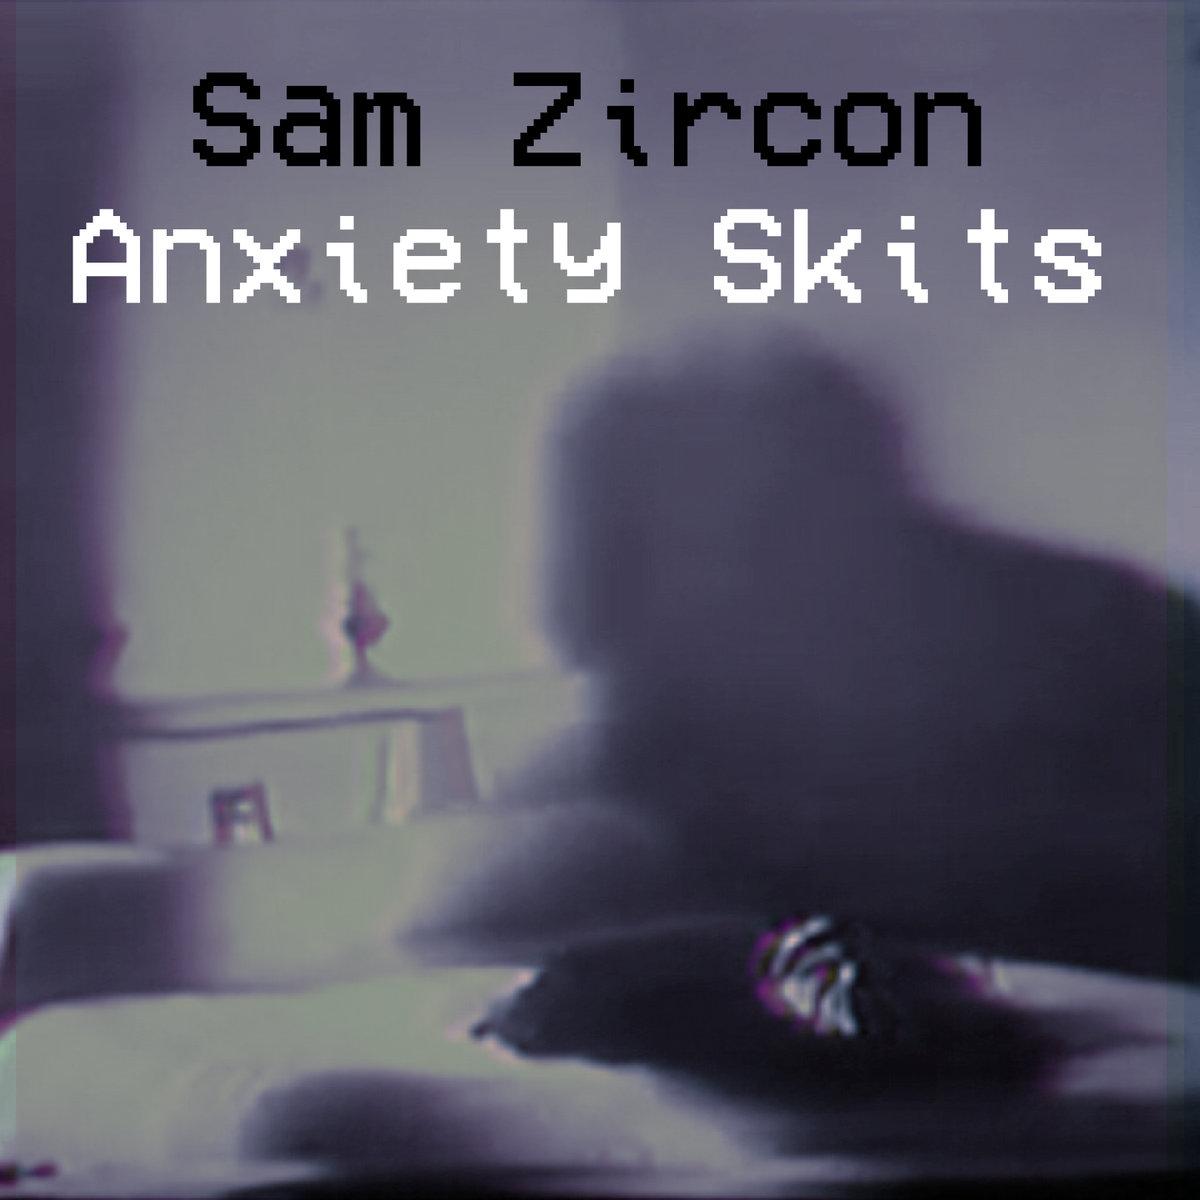 Monolith Cocktail - Sam Zircon